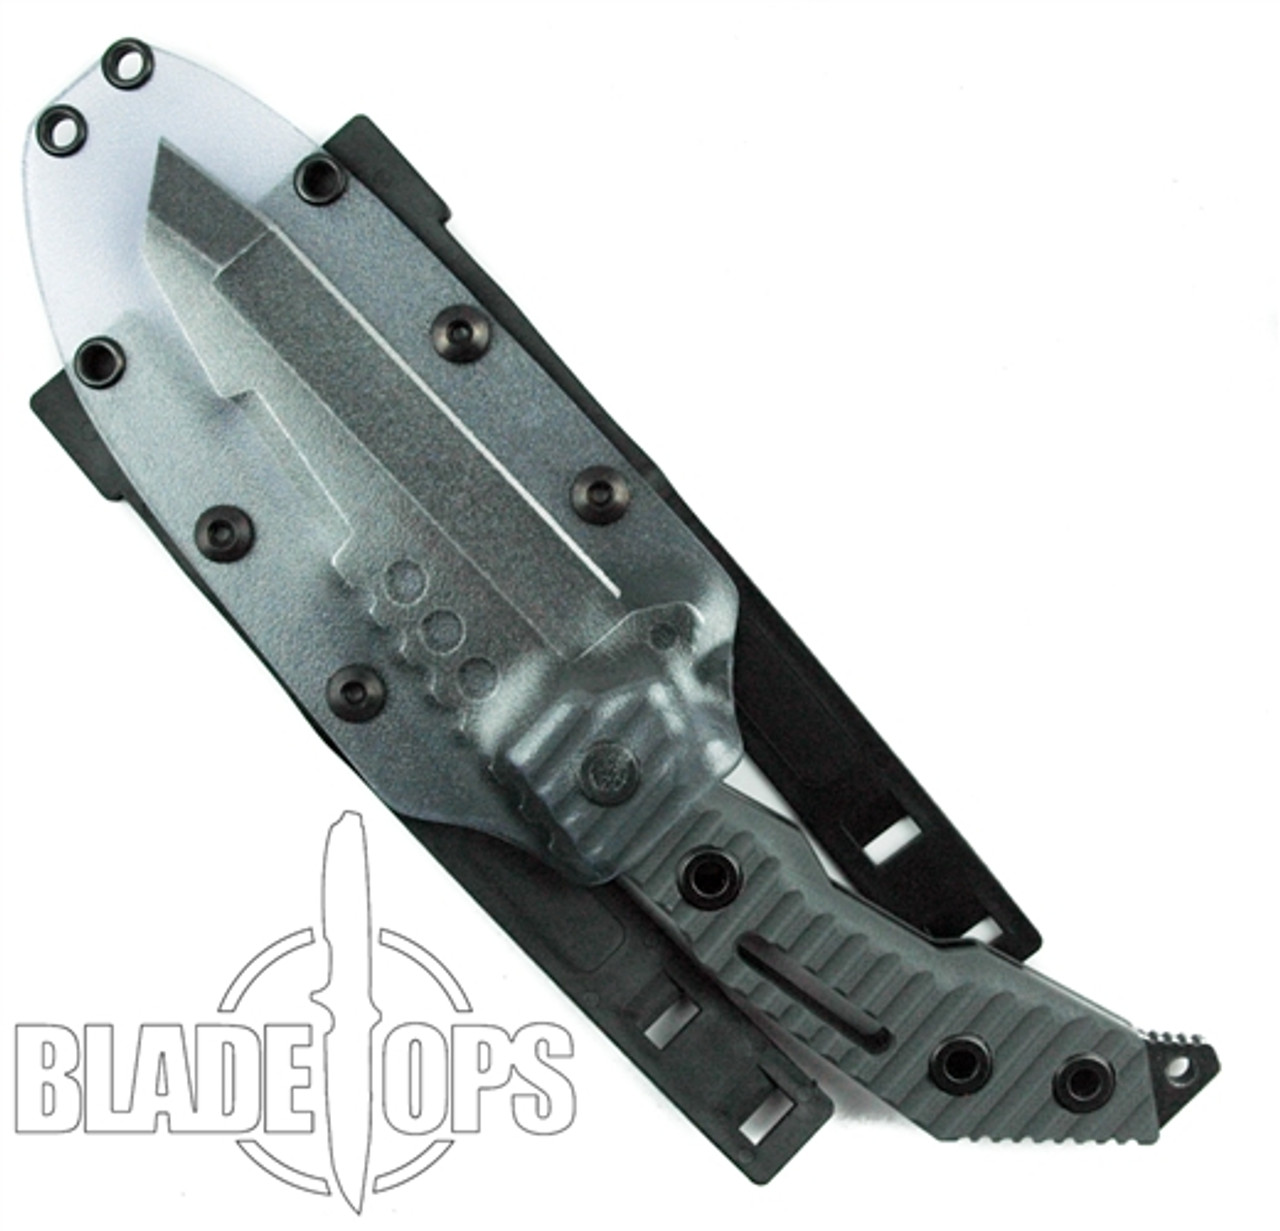 Quartermaster Knives Thomas Magnum QTR-7 Fixed Blade Knife, Texas Tea